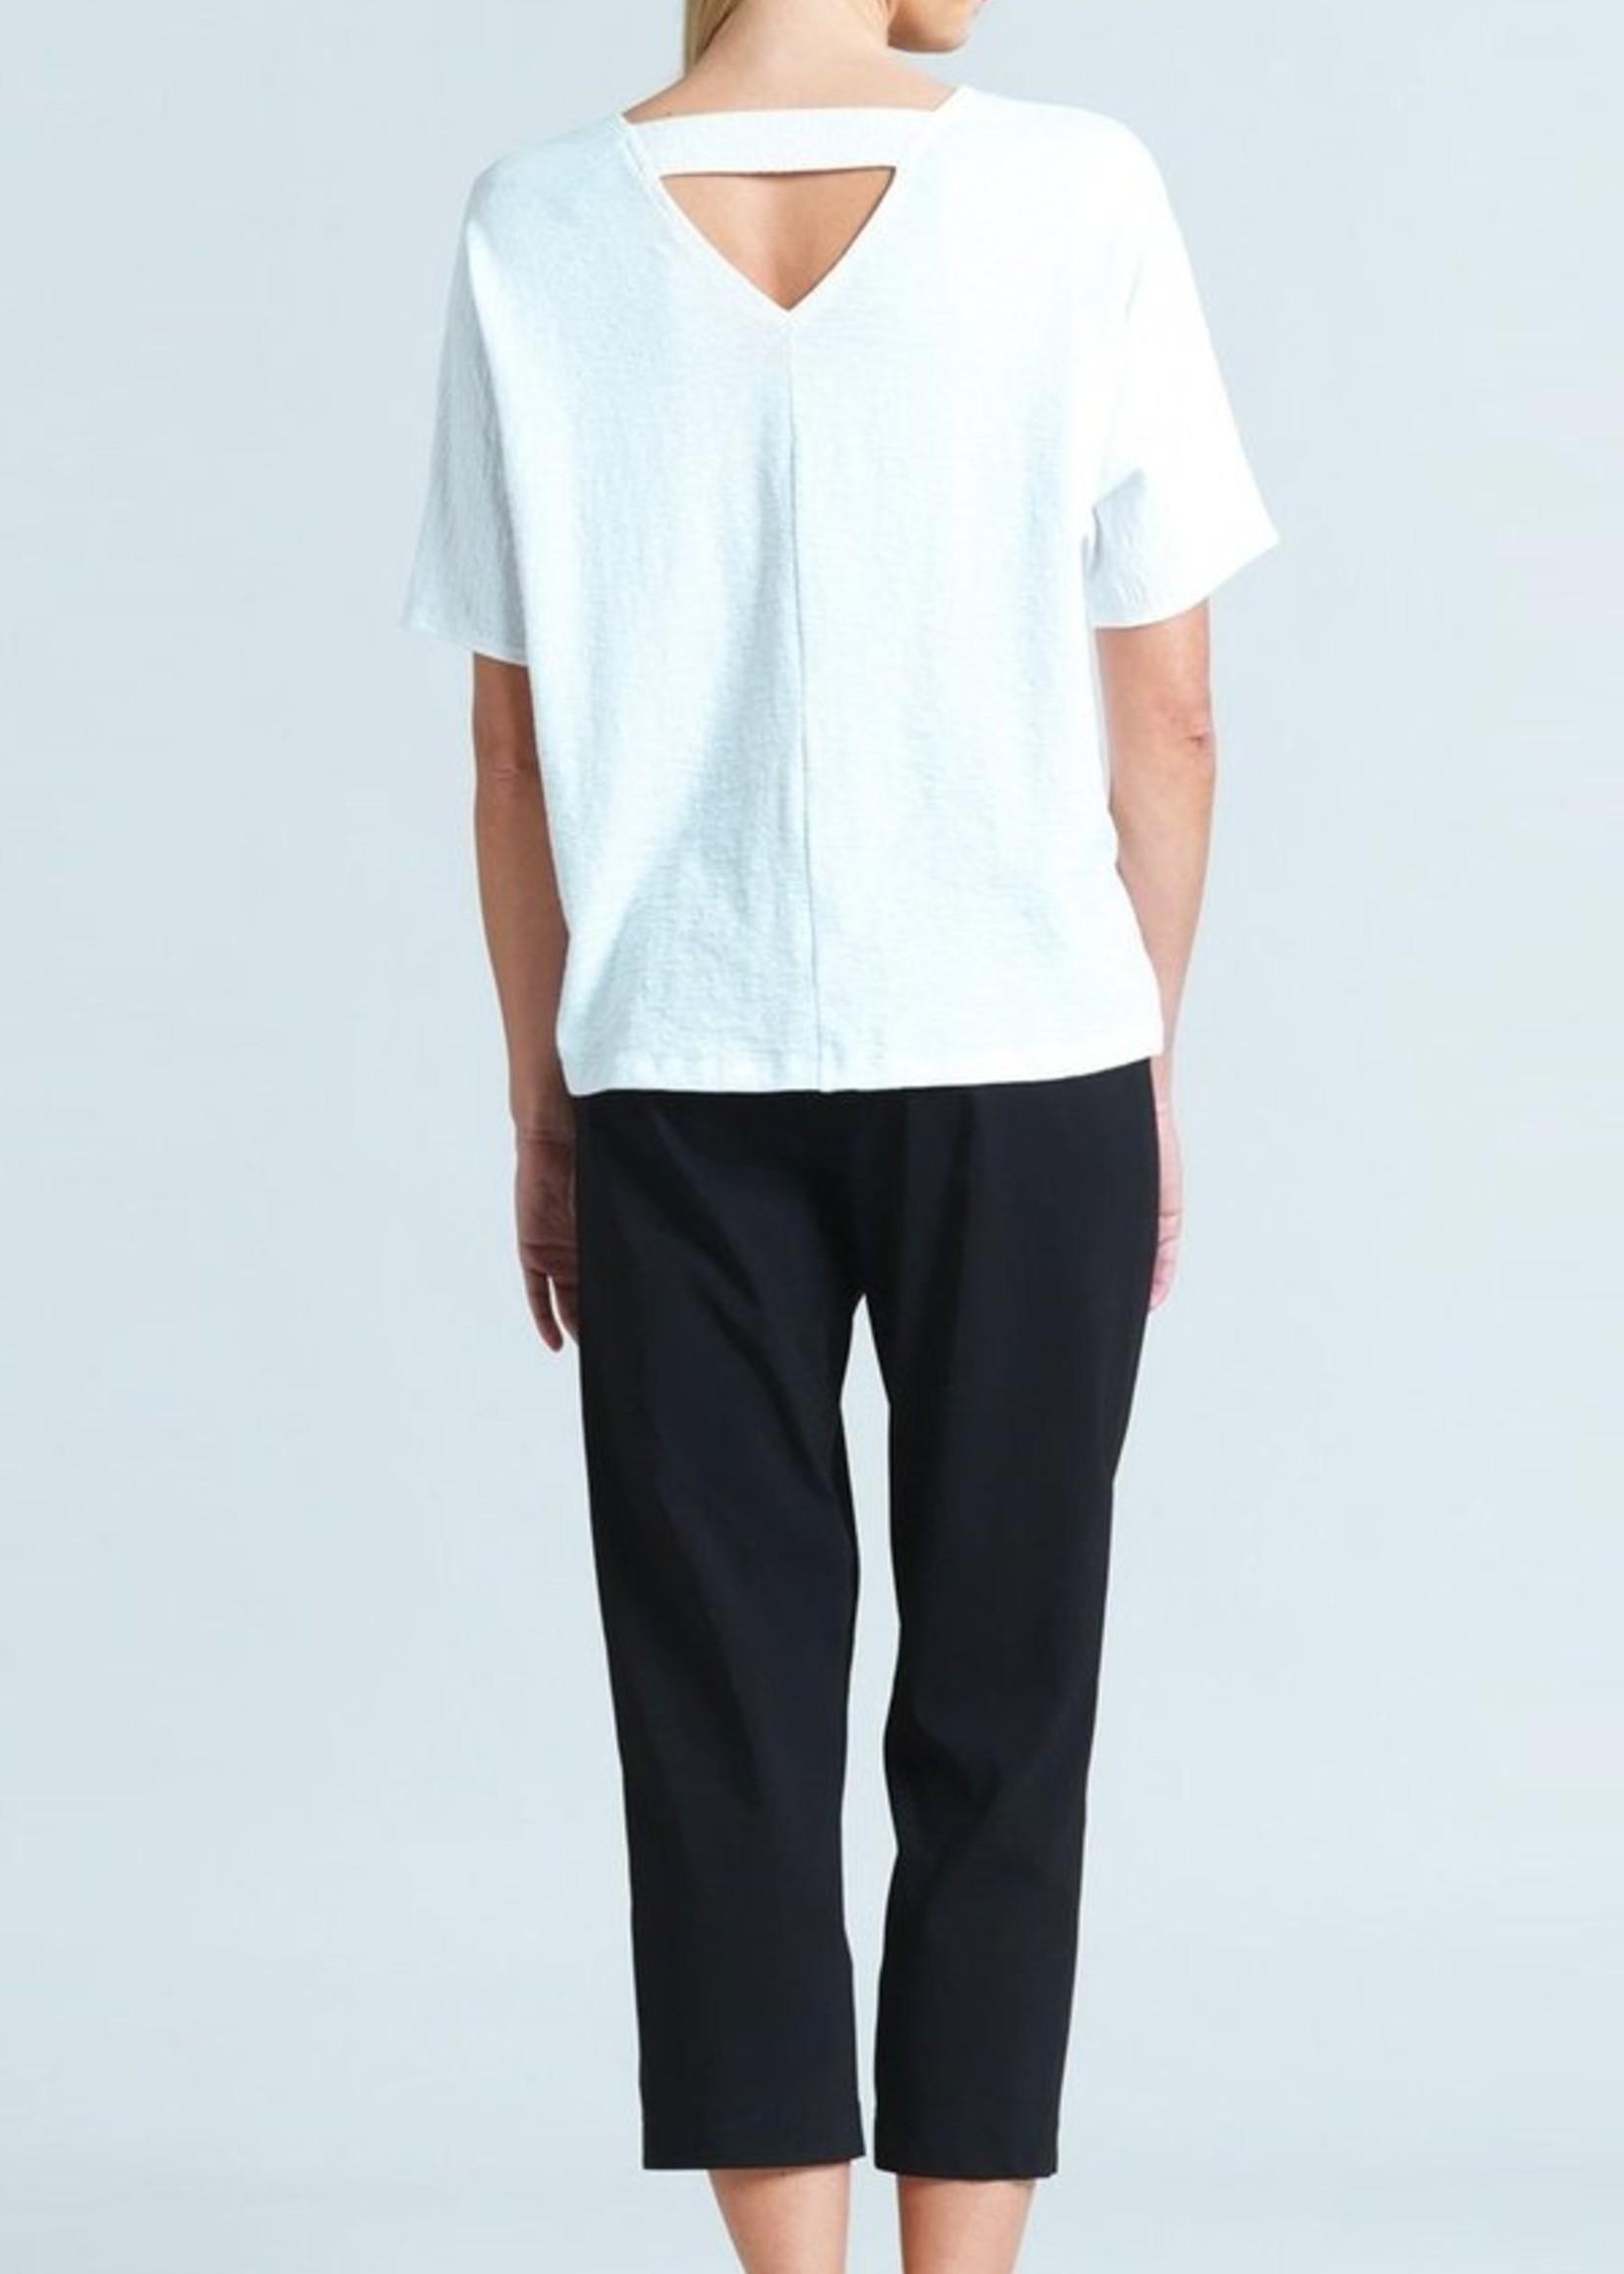 Clara Sunwoo Clara Sunwoo Solid Cotton Knit V-Cross Bar Cut-Out Top